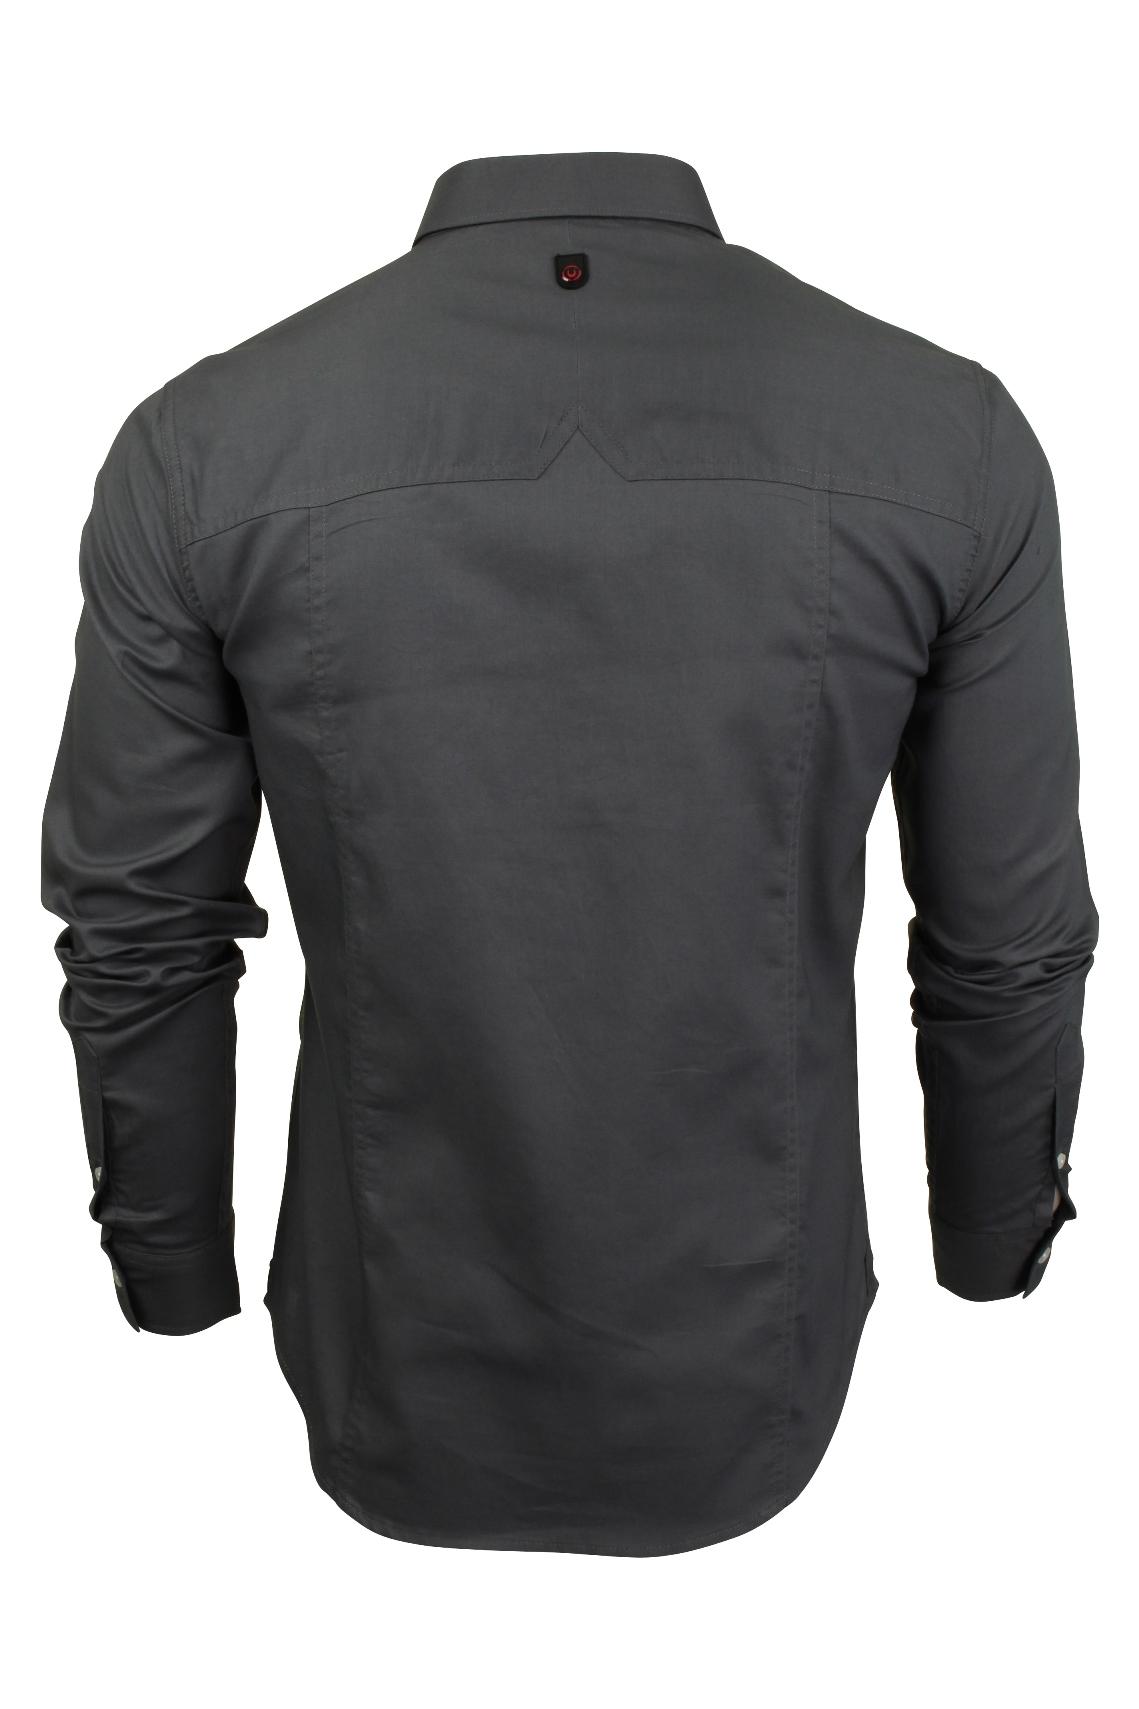 Para-hombres-camisa-de-manga-larga-por-Pato-Y-Cubierta-039-abedul-039 miniatura 5